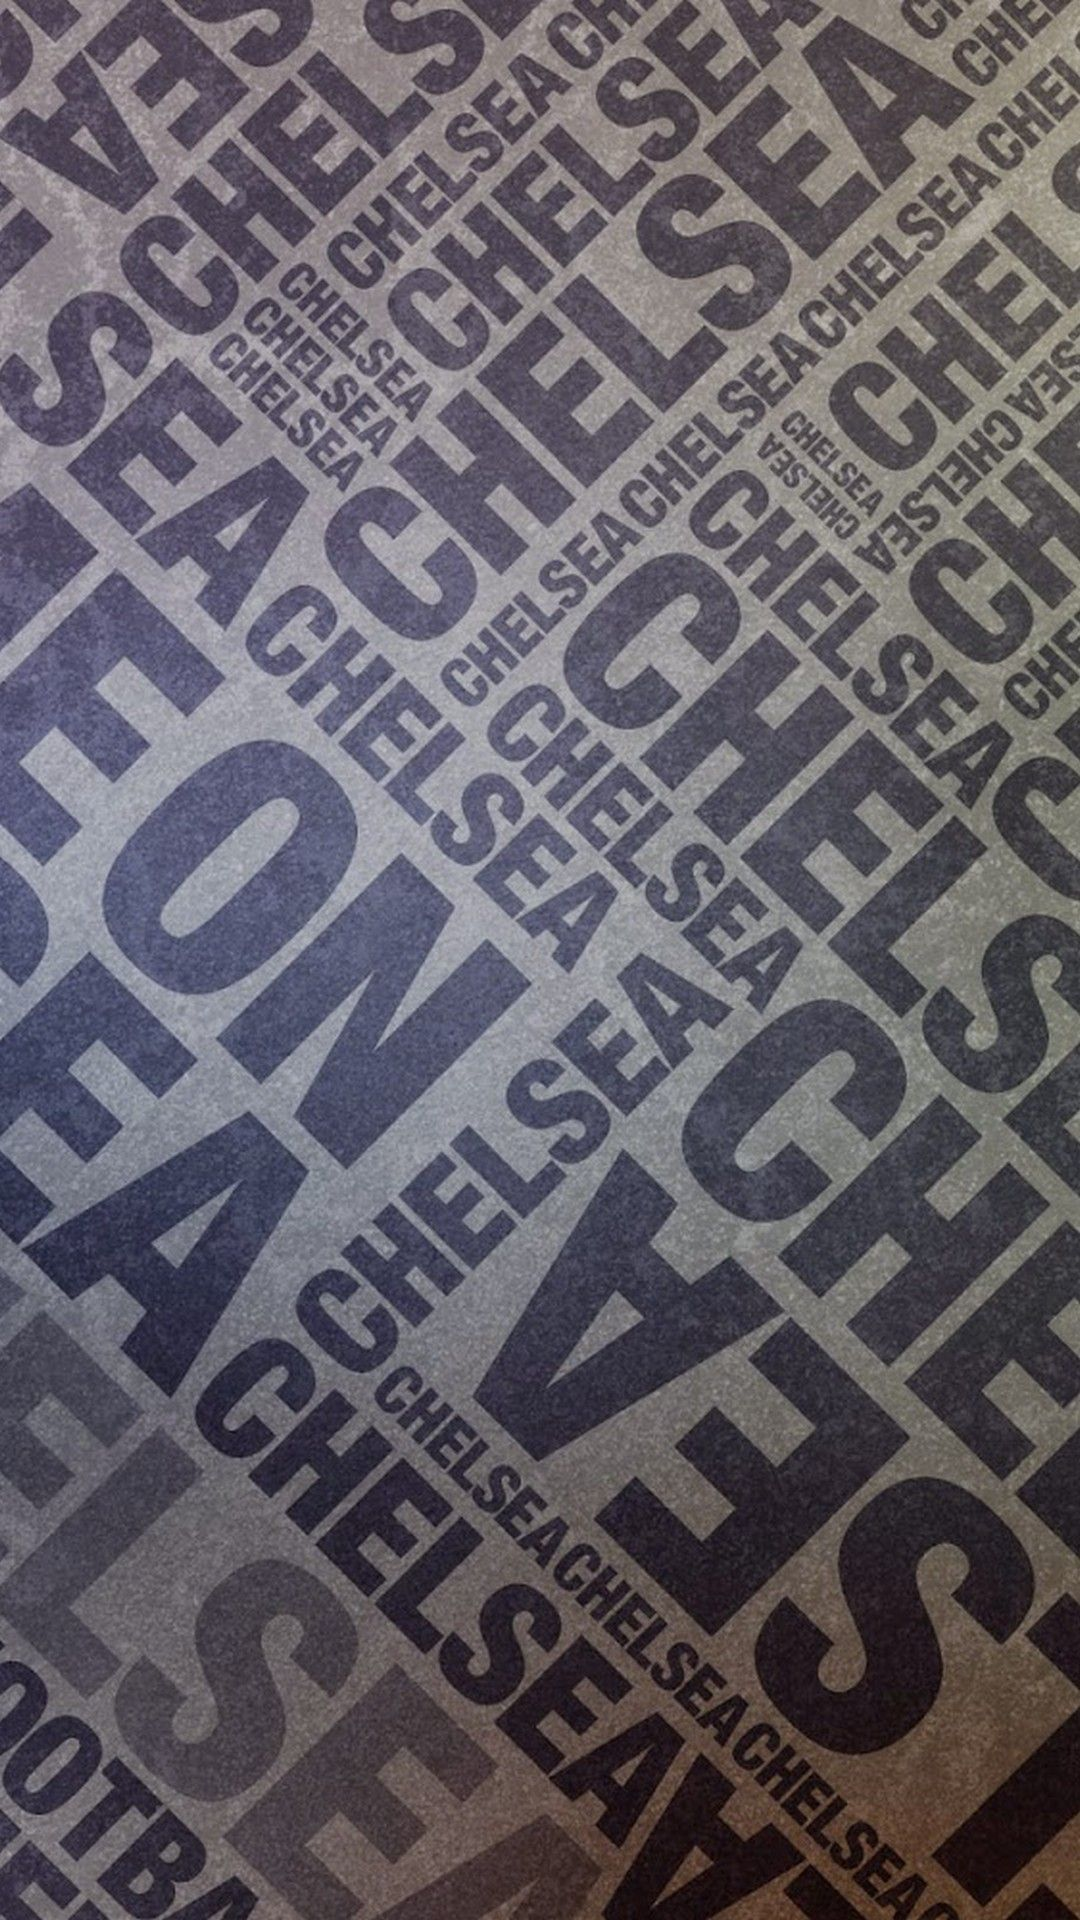 Wallpaper Chelsea Soccer iPhone เชลซี, วอลเปเปอร์